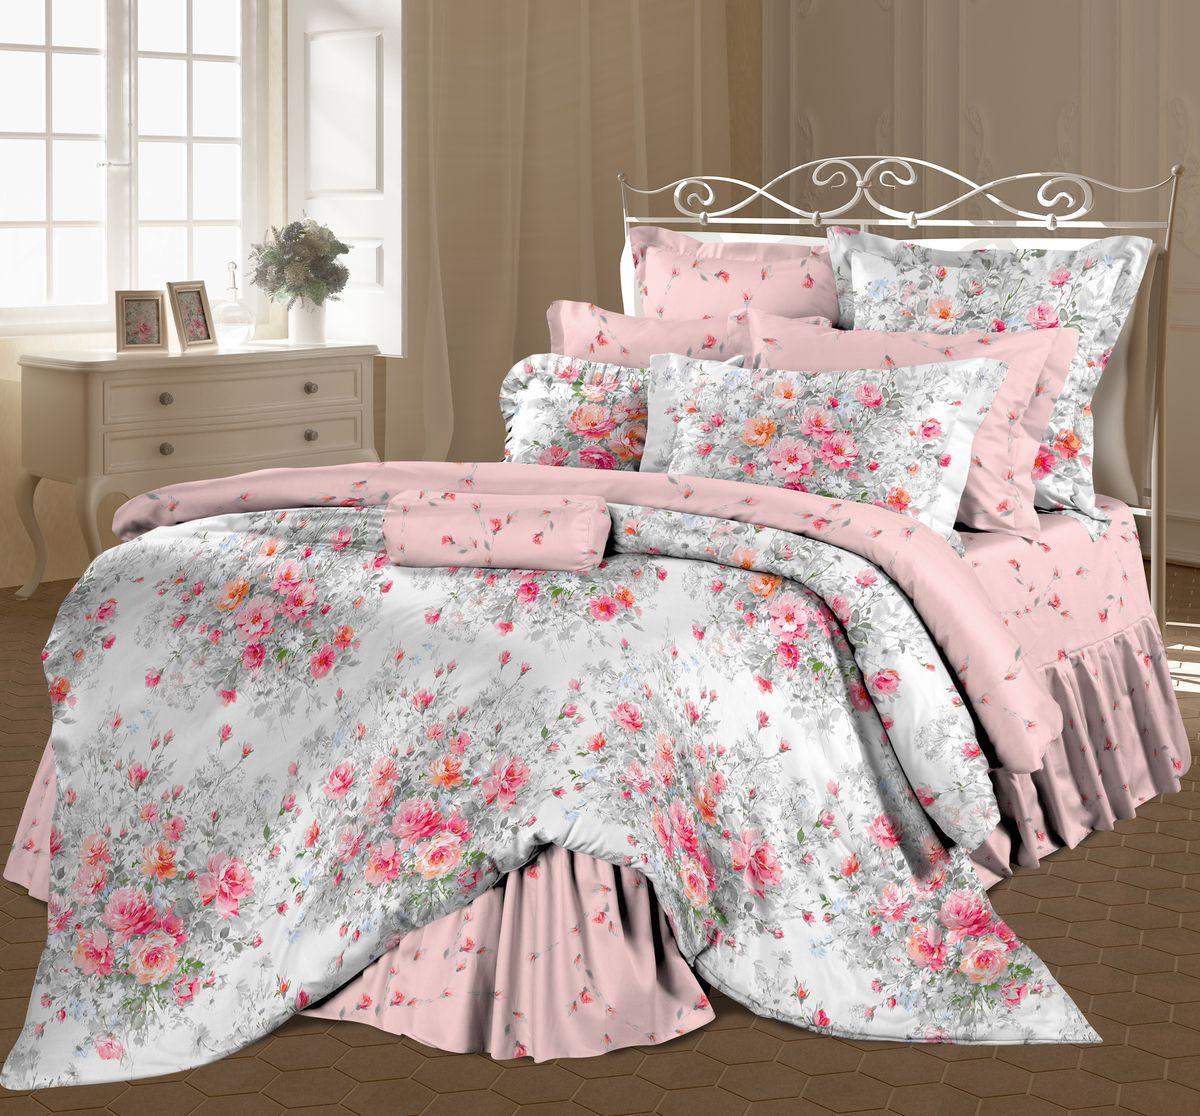 Комплект белья Романтика Французский букет, евро, наволочки 70 x 70, цвет: розовый. 298711298711